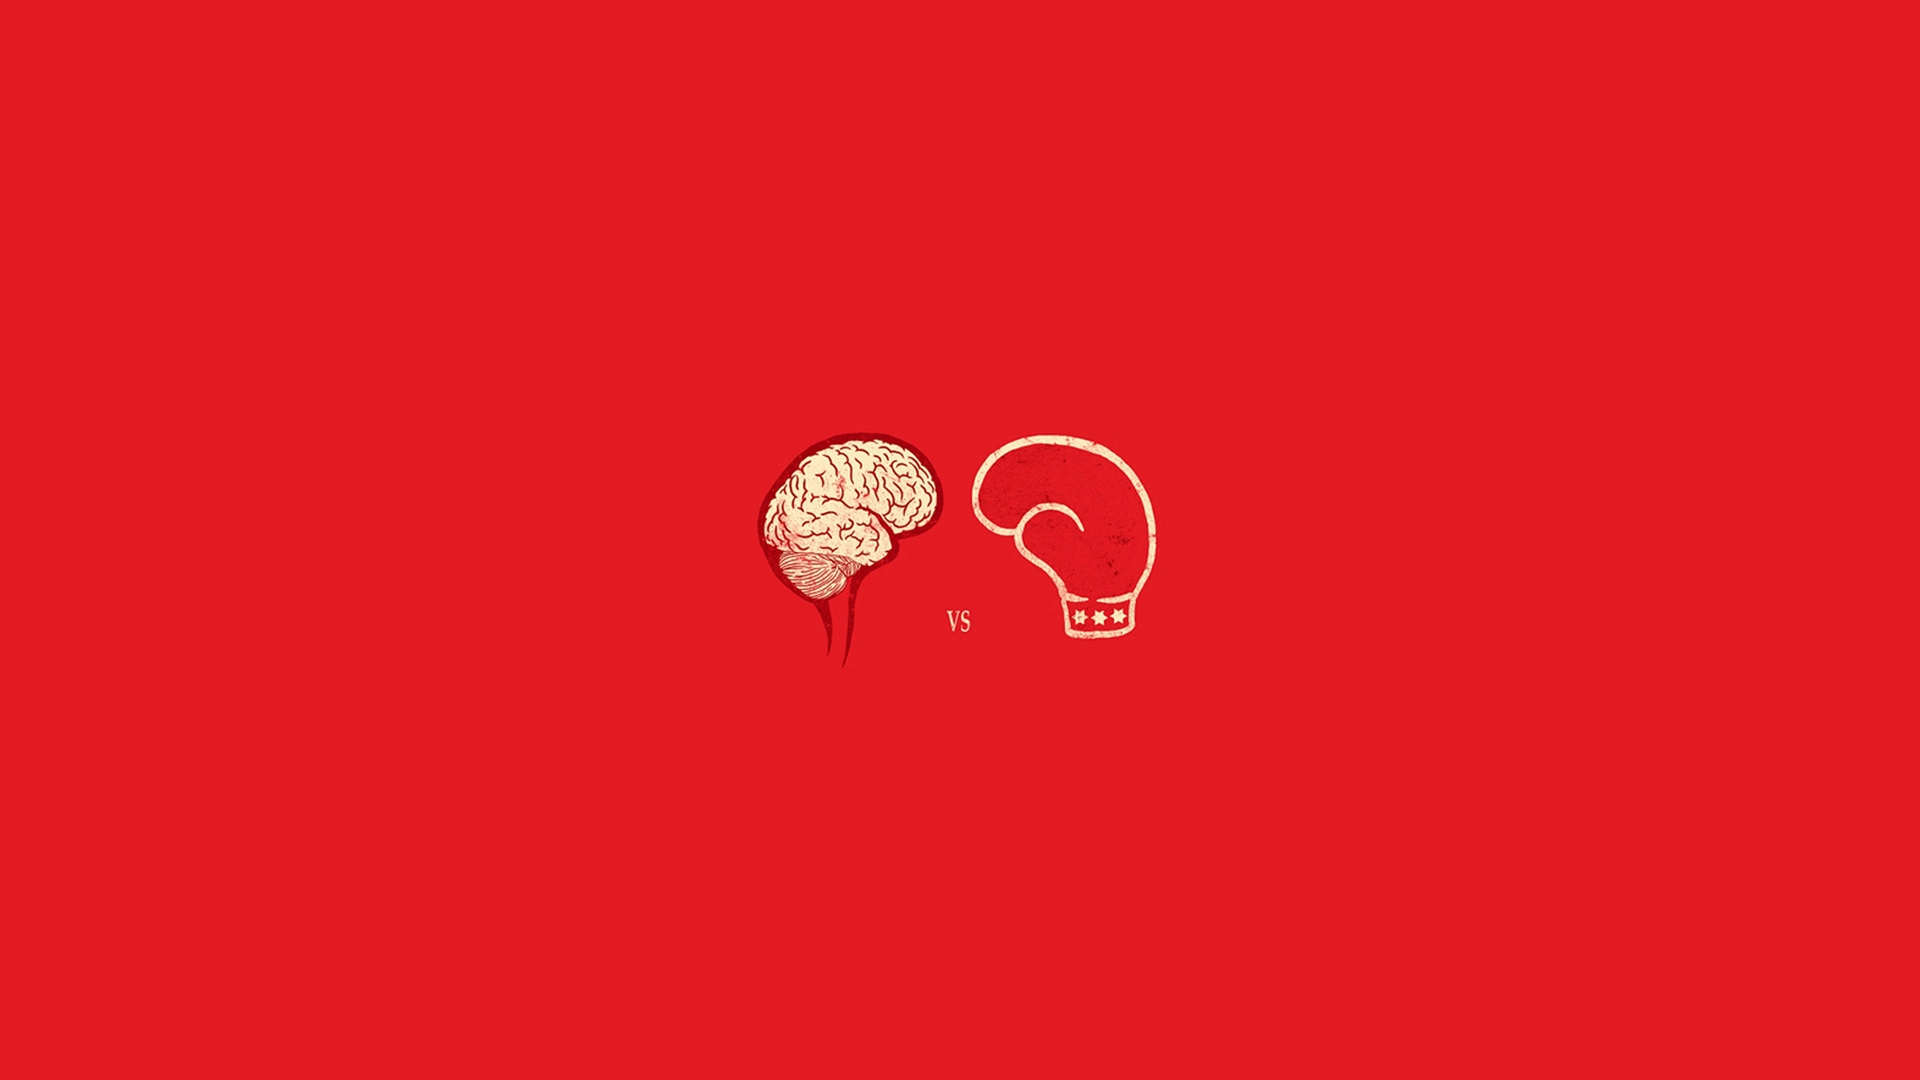 Download wallpaper 1920x1080 glove mind boxing brain strength 1920x1080